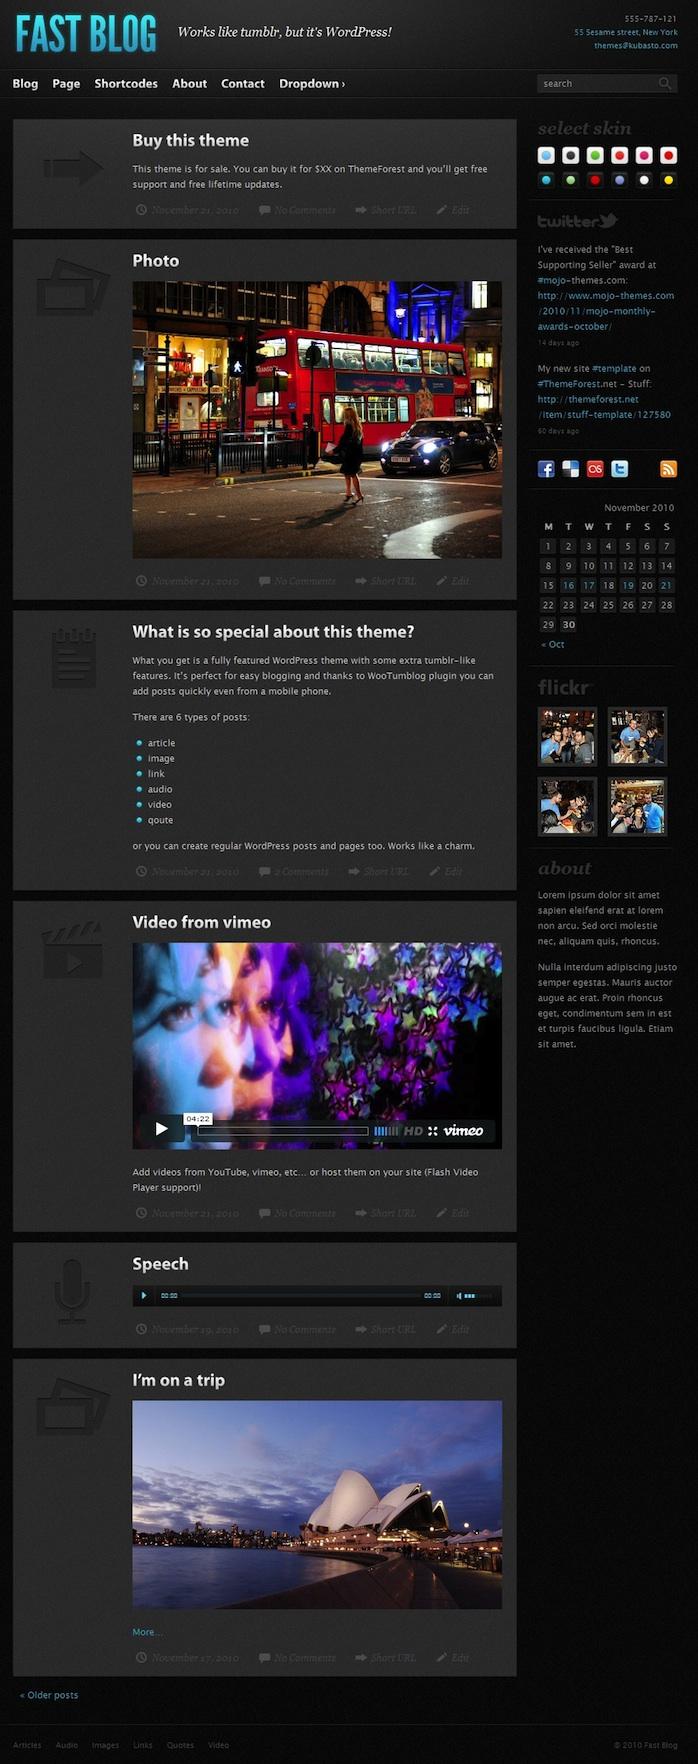 Tumblr-like WordPress Theme - Fast Blog